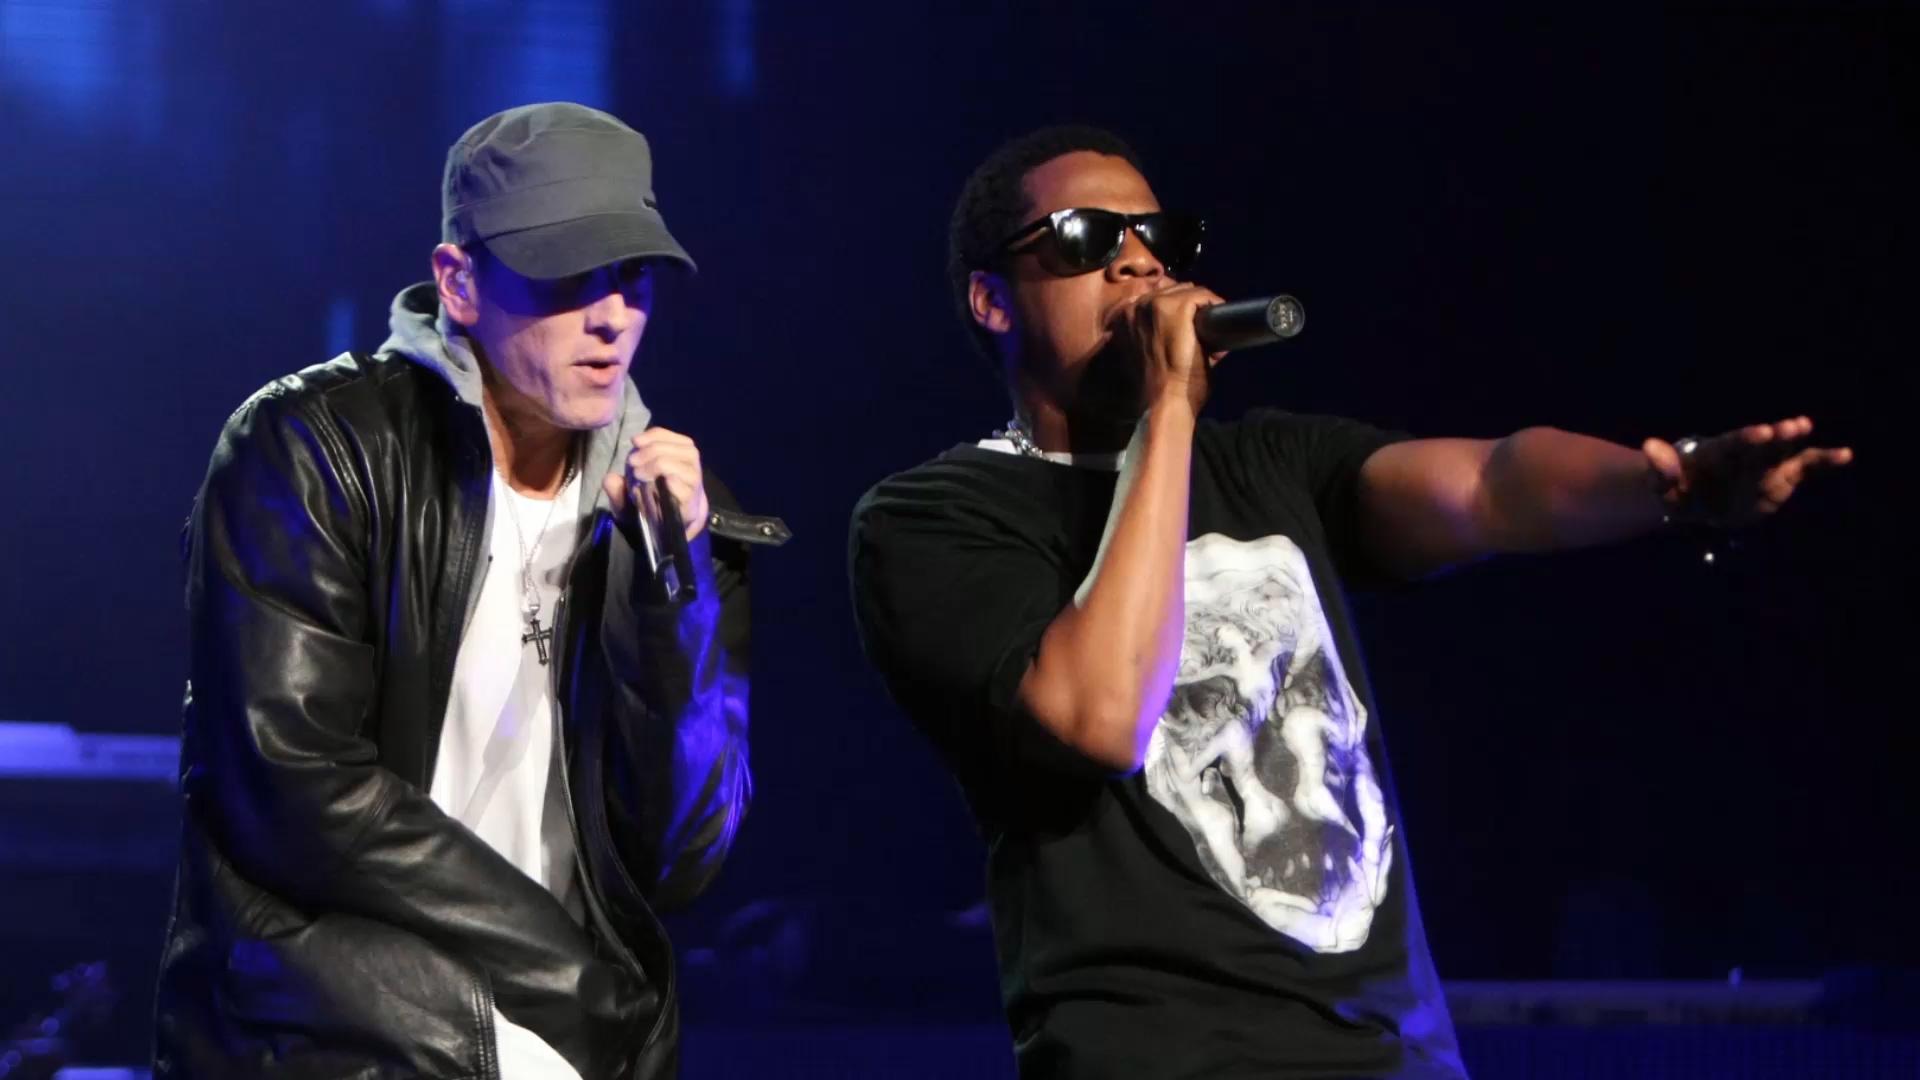 Eminem's estranged father dies at 67 after heart attack